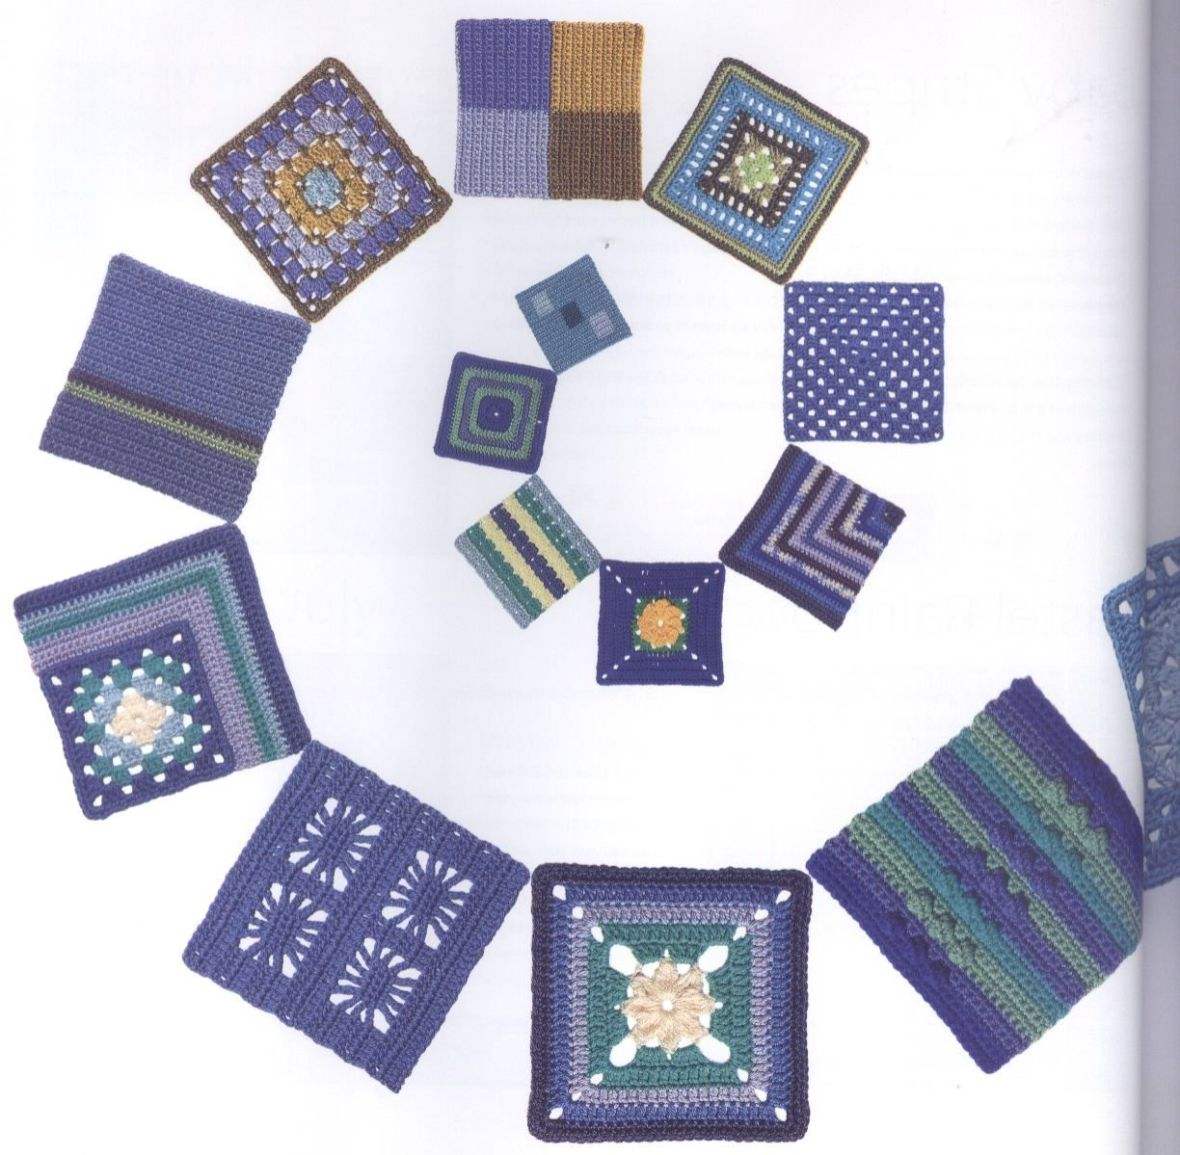 200 Crocheted Blocks for blankets, throws & Afghans 032